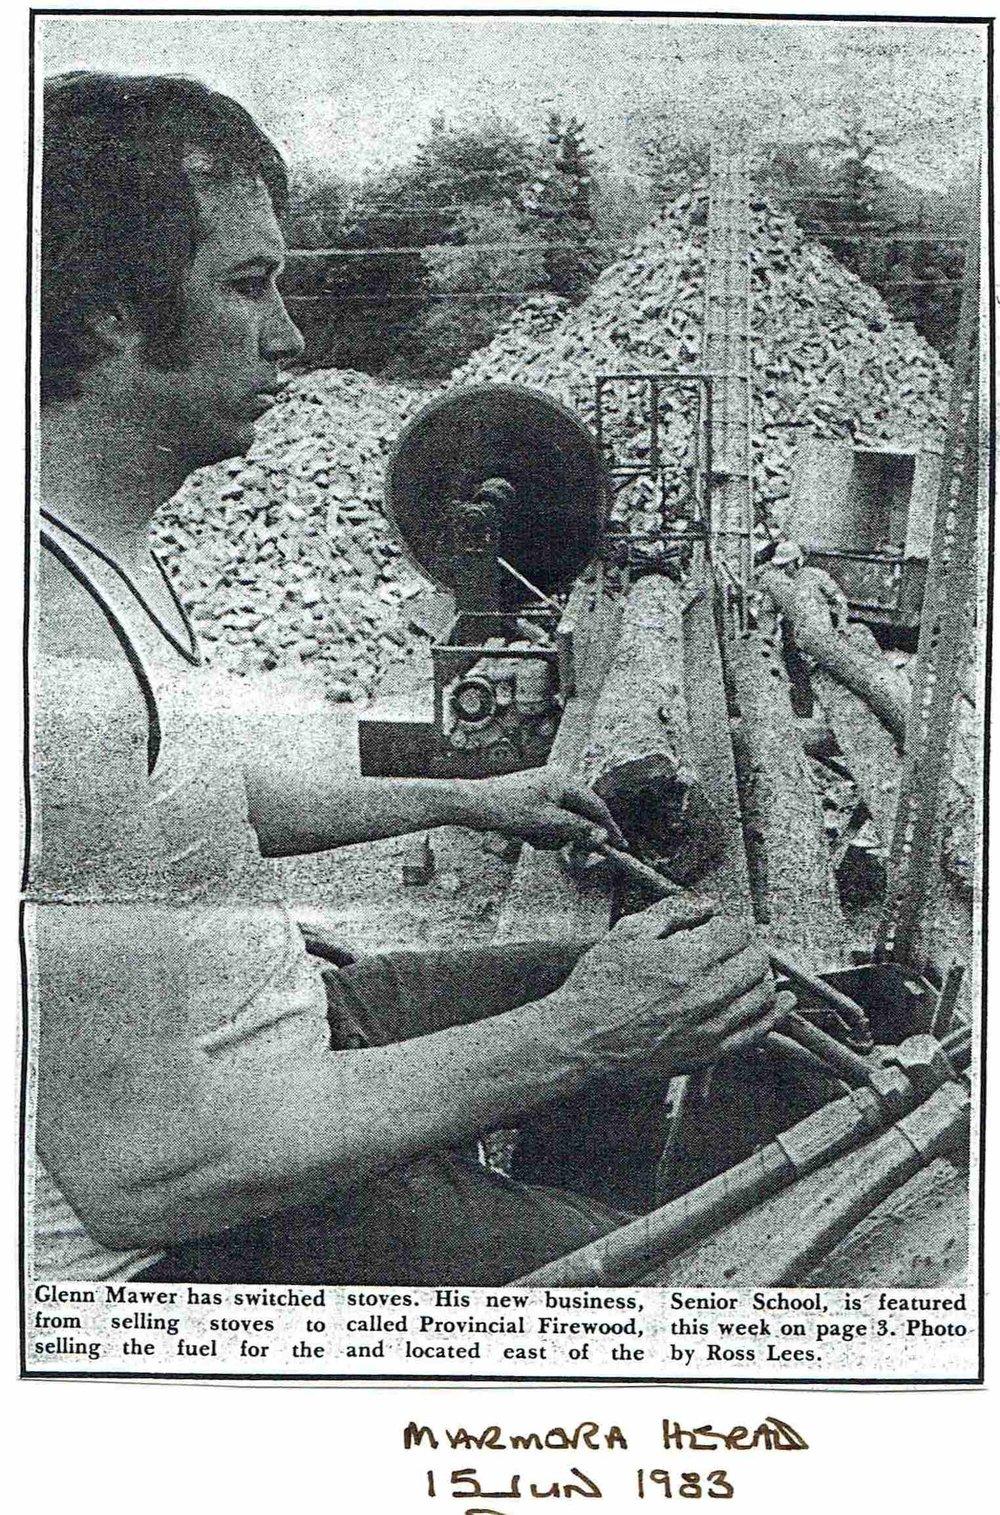 1983 Provincial Firewood Mawer.JPG